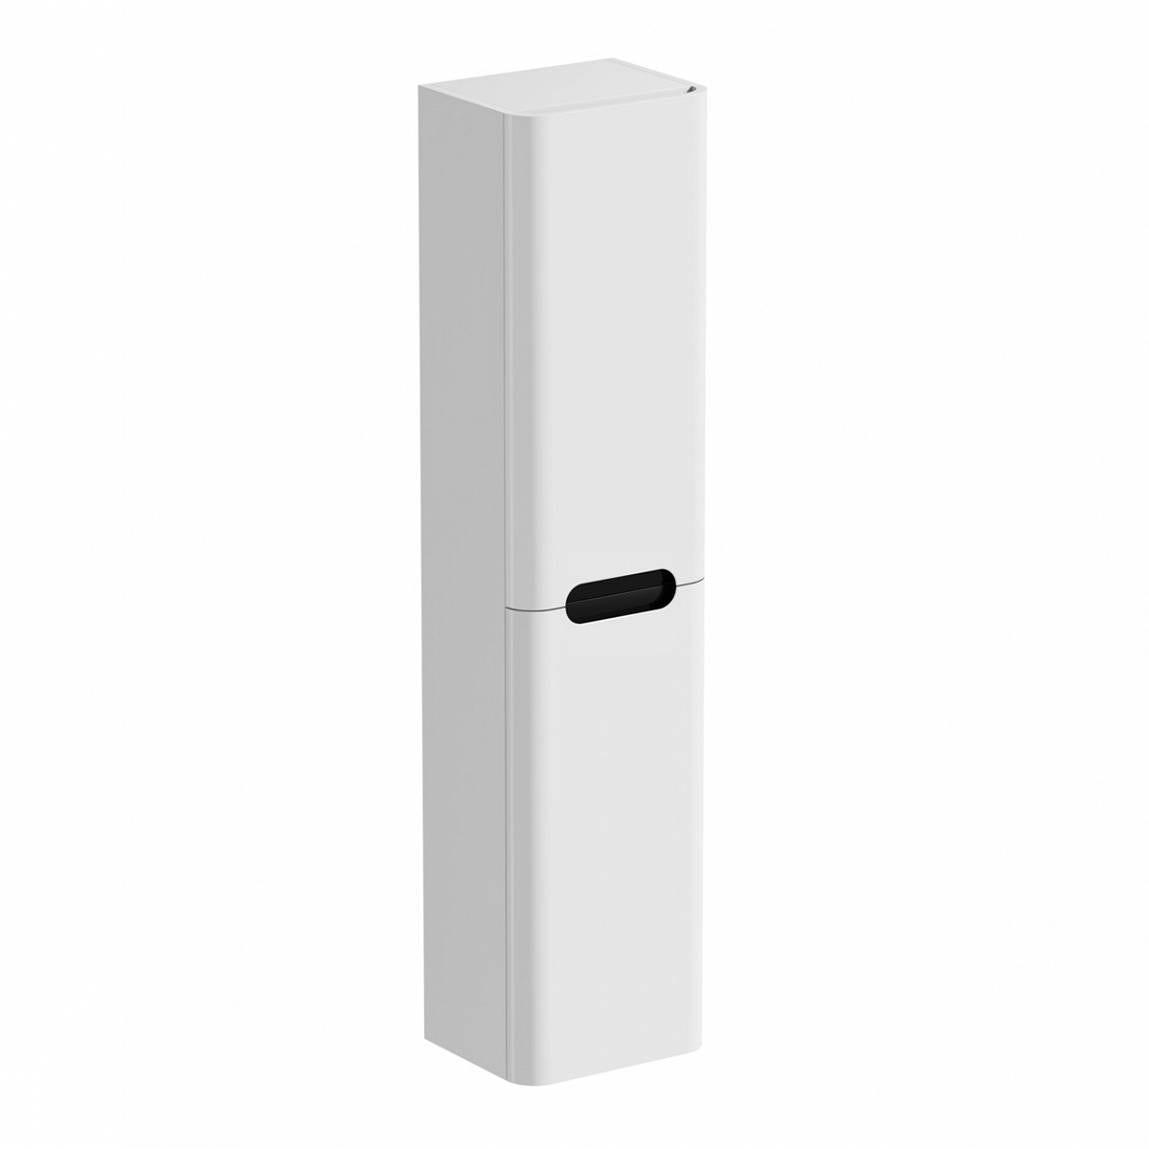 Mode Ellis select essen wall hung cabinet